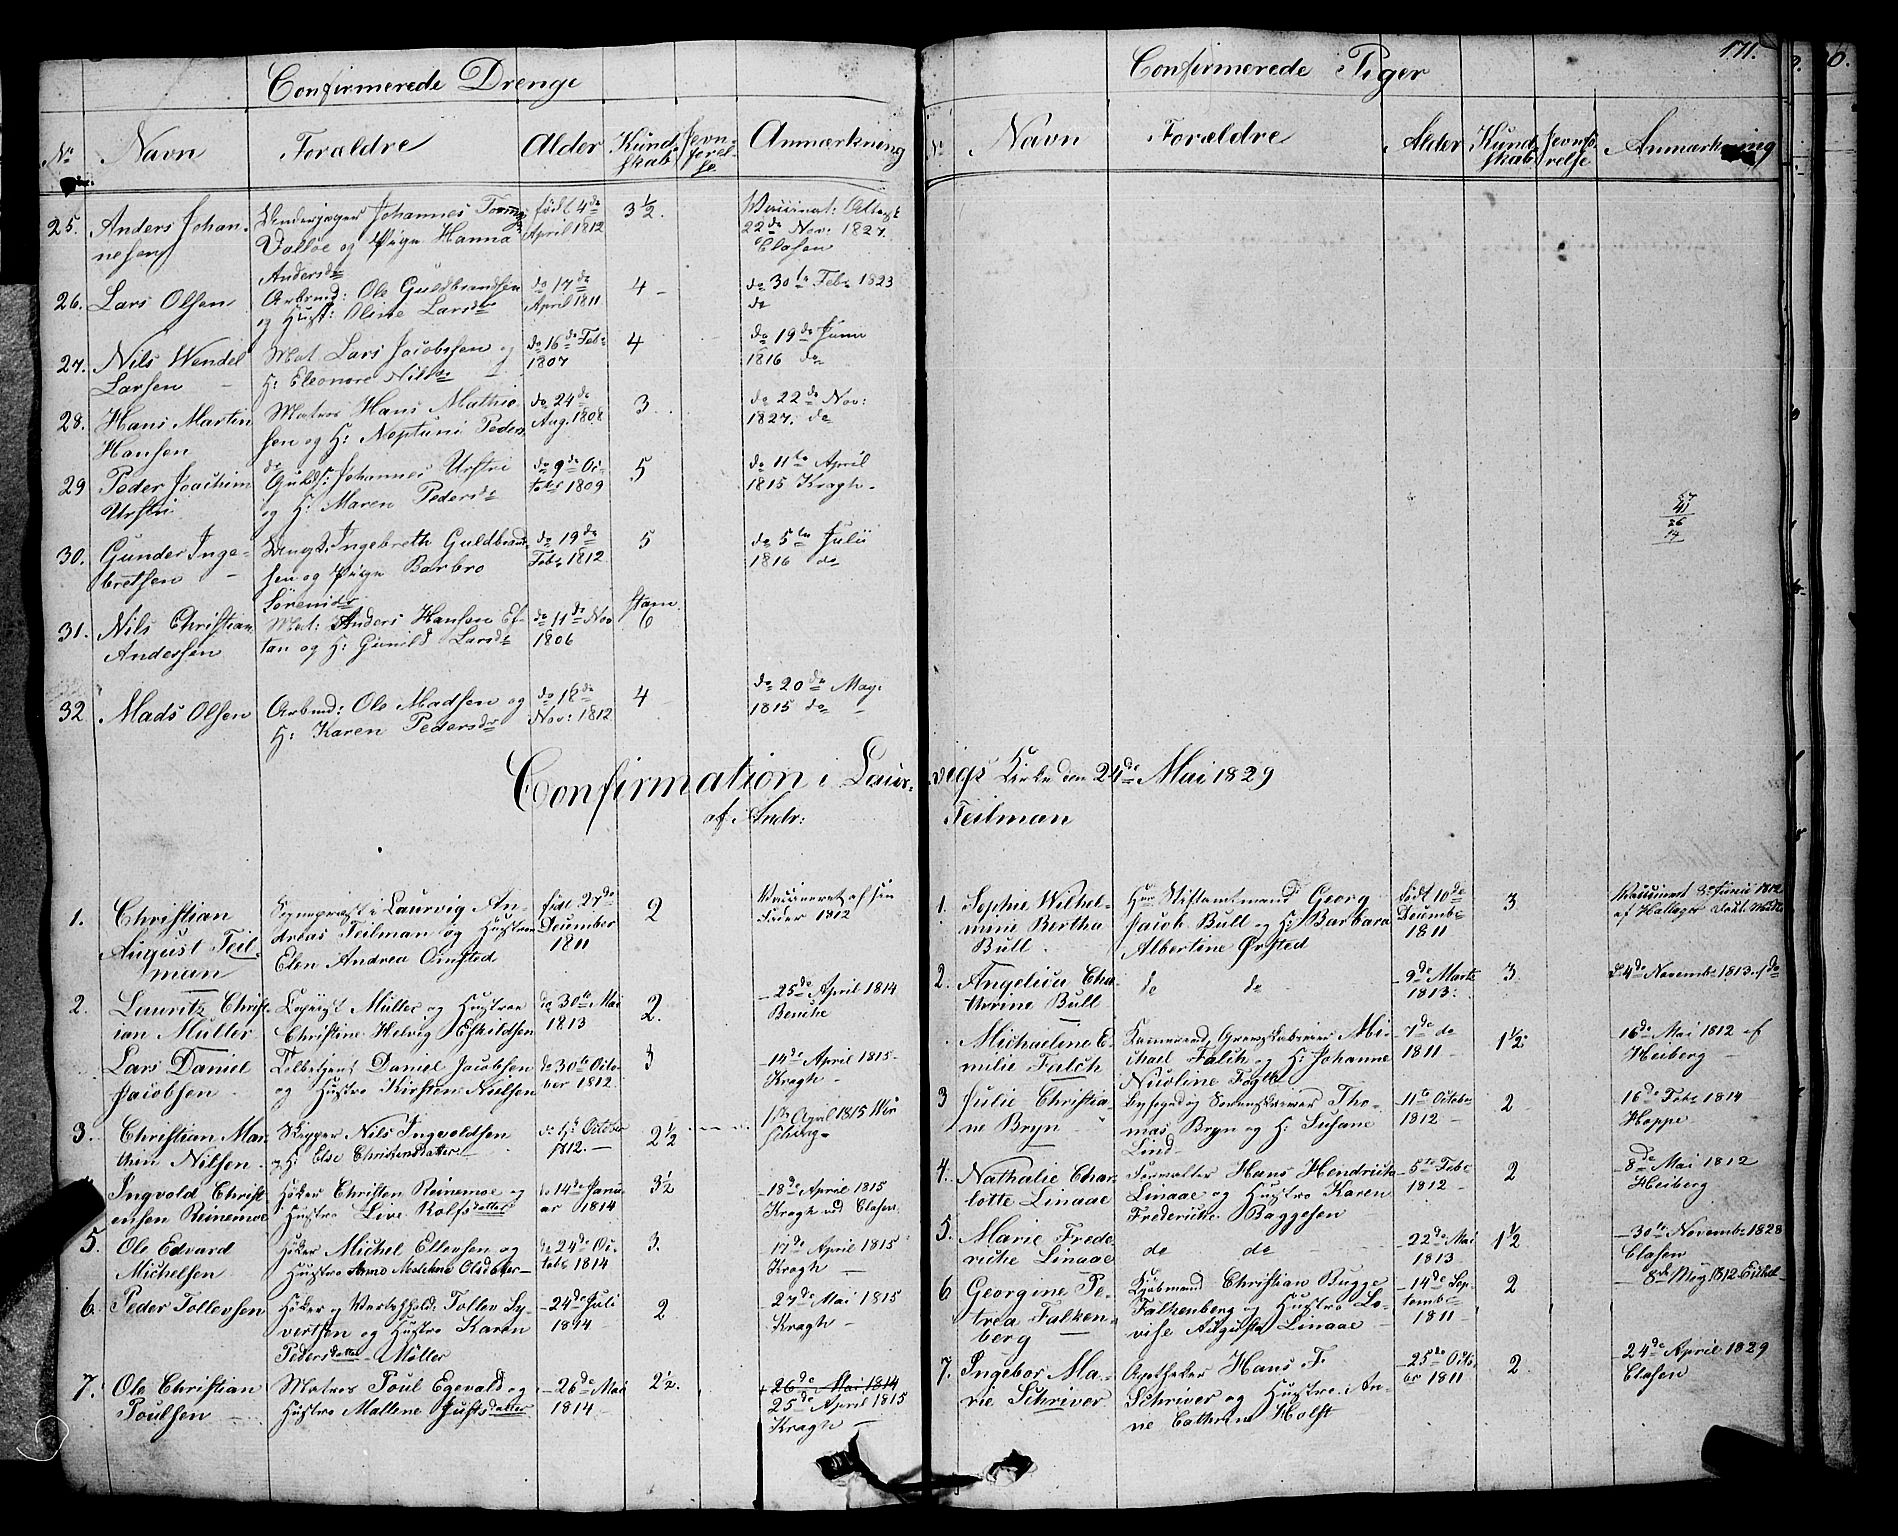 SAKO, Larvik kirkebøker, F/Fa/L0002: Ministerialbok nr. I 2, 1825-1847, s. 171